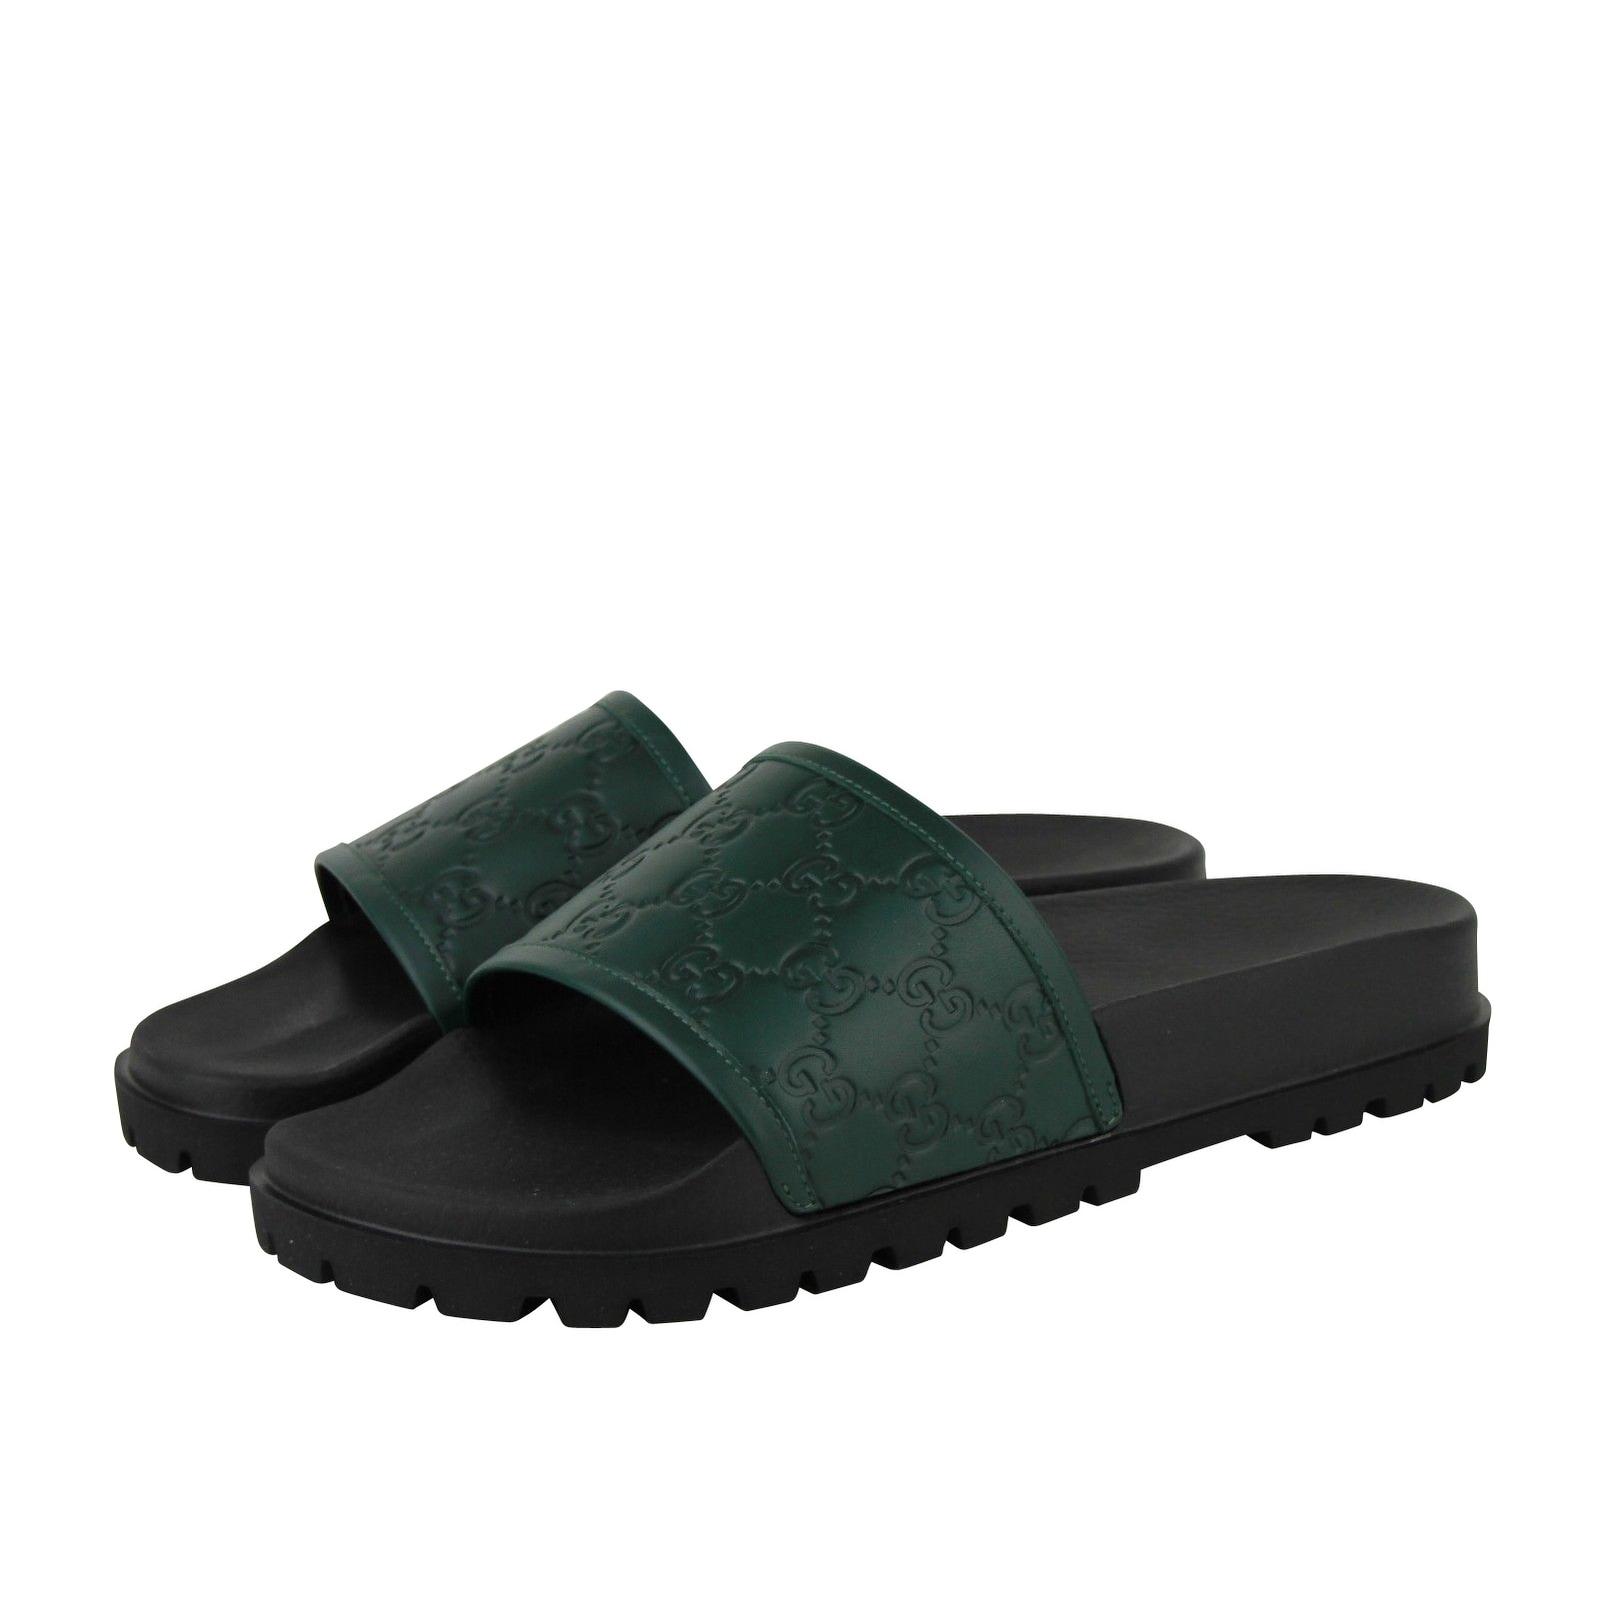 05ff9c28b Shop Gucci Guccissima Pattern Green / Black Leather Sandals 431070 ...